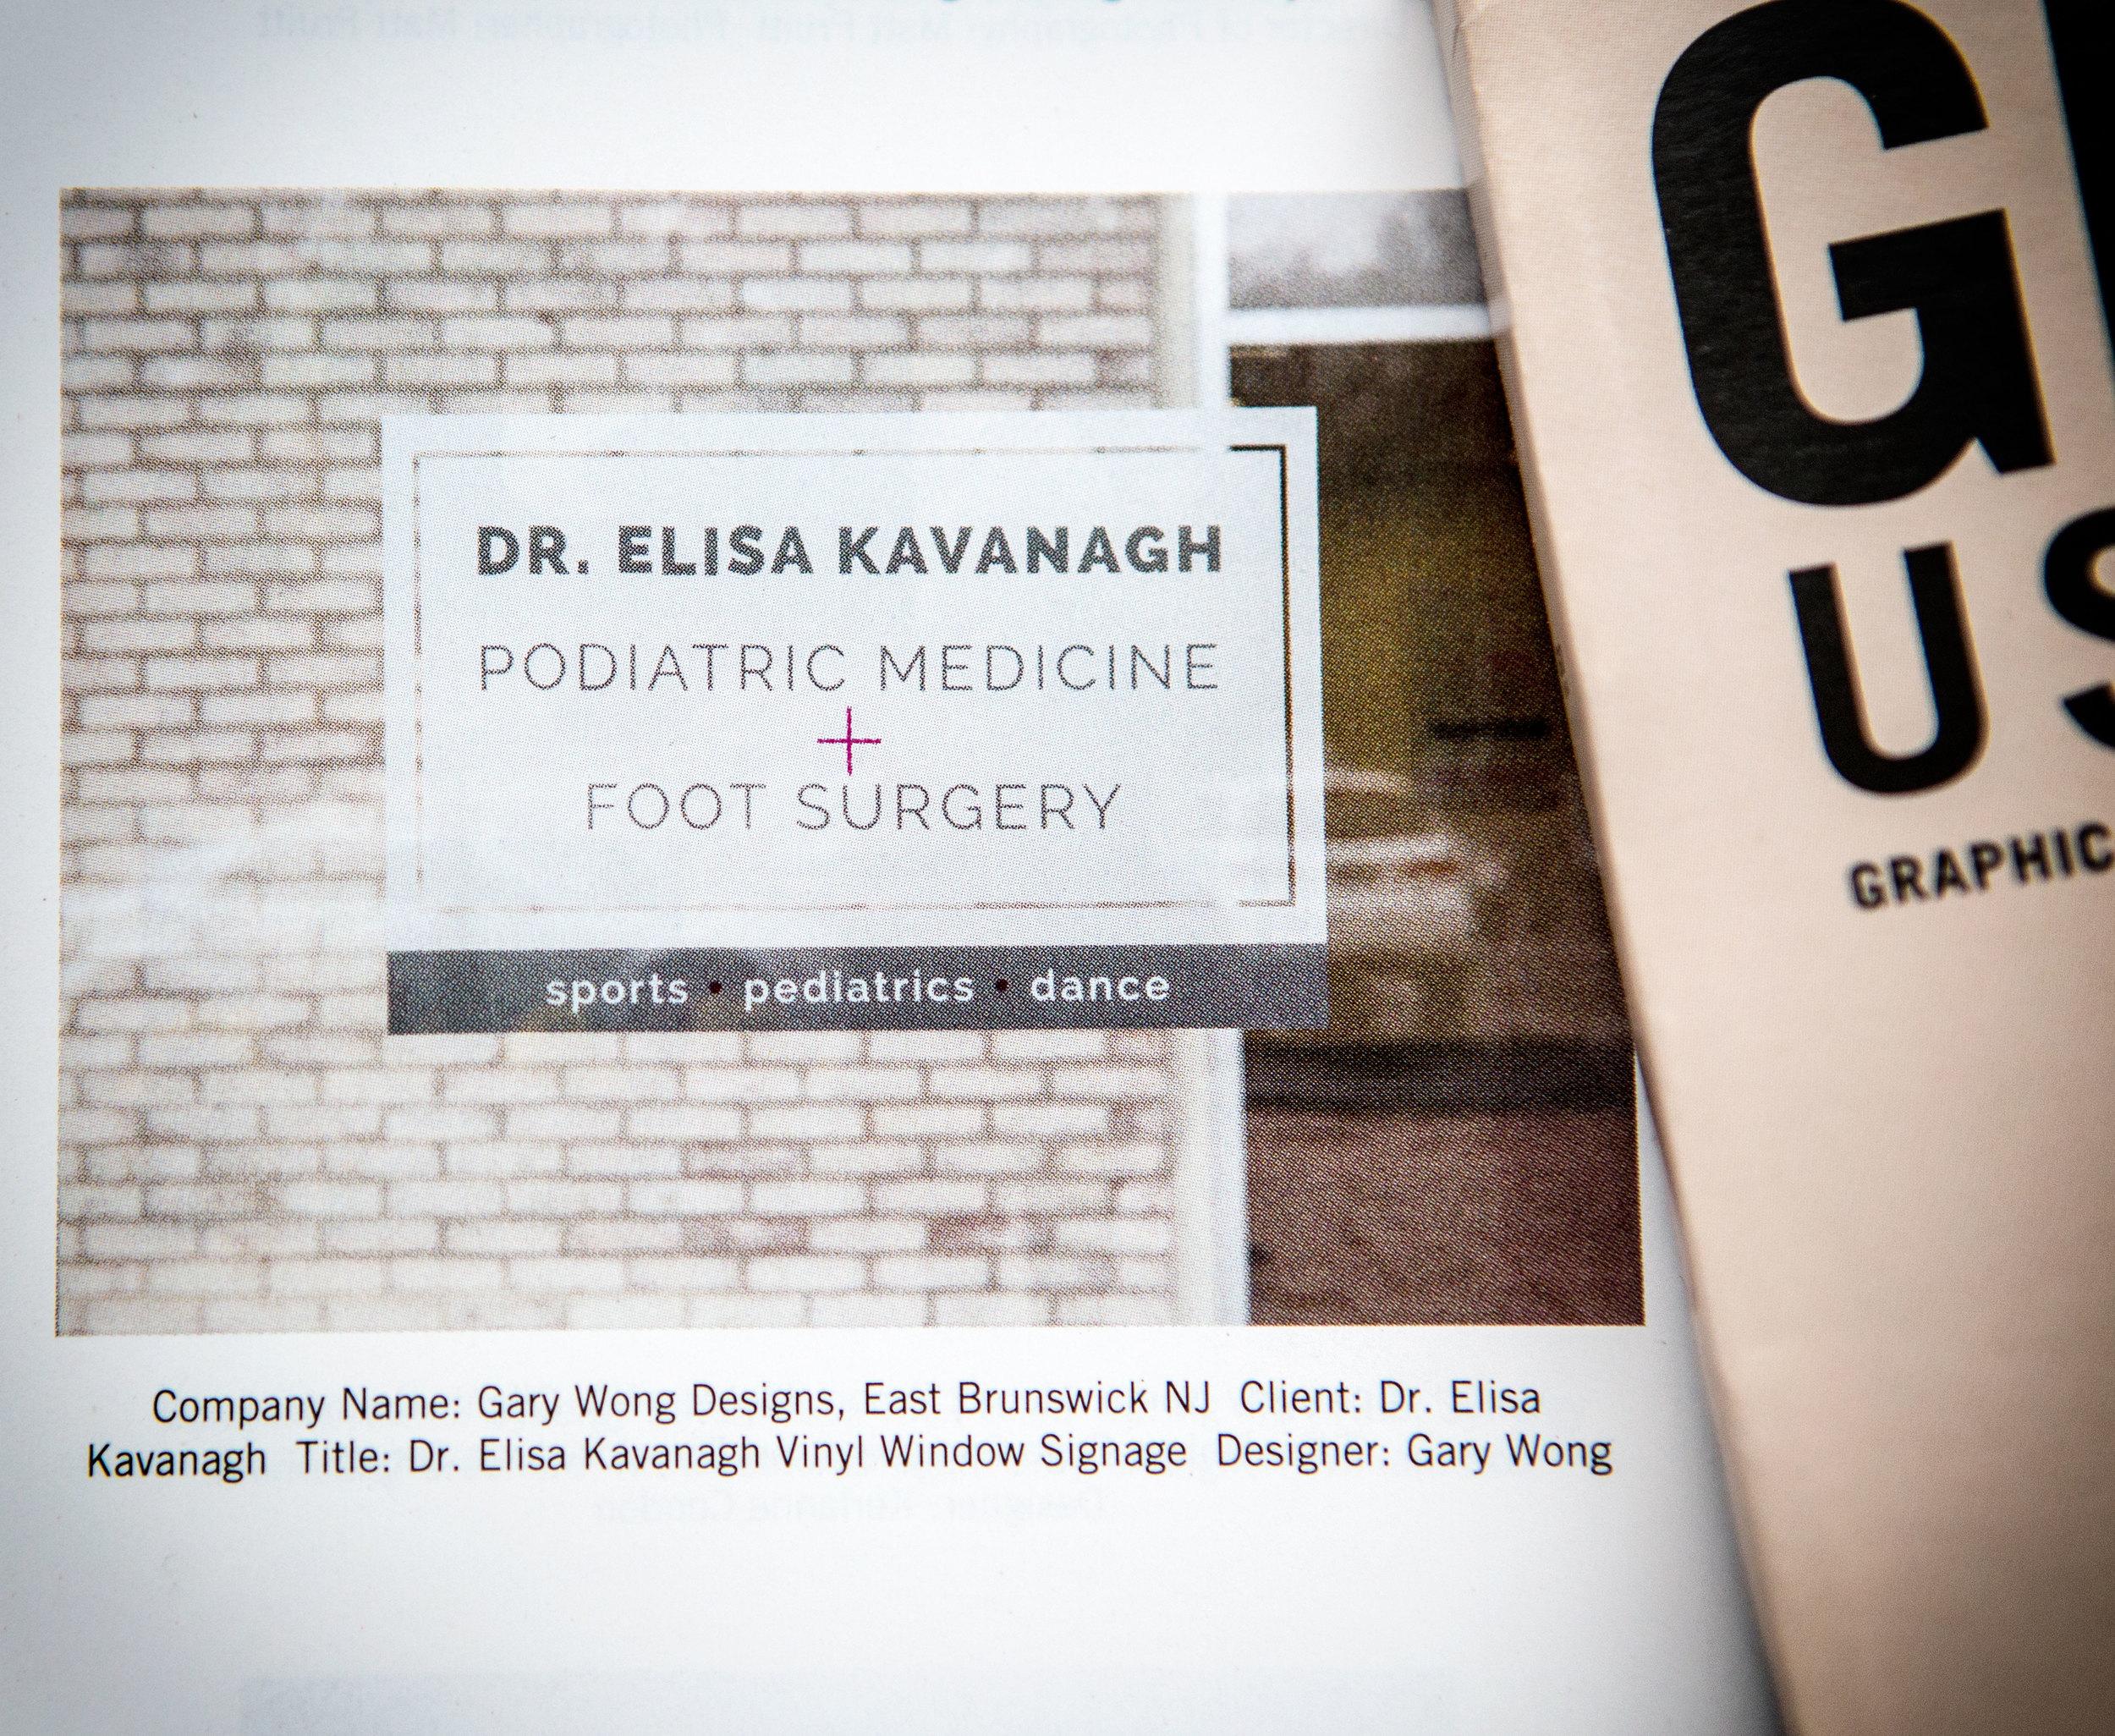 Category: Signage Client: Dr. Elisa Kavanagh